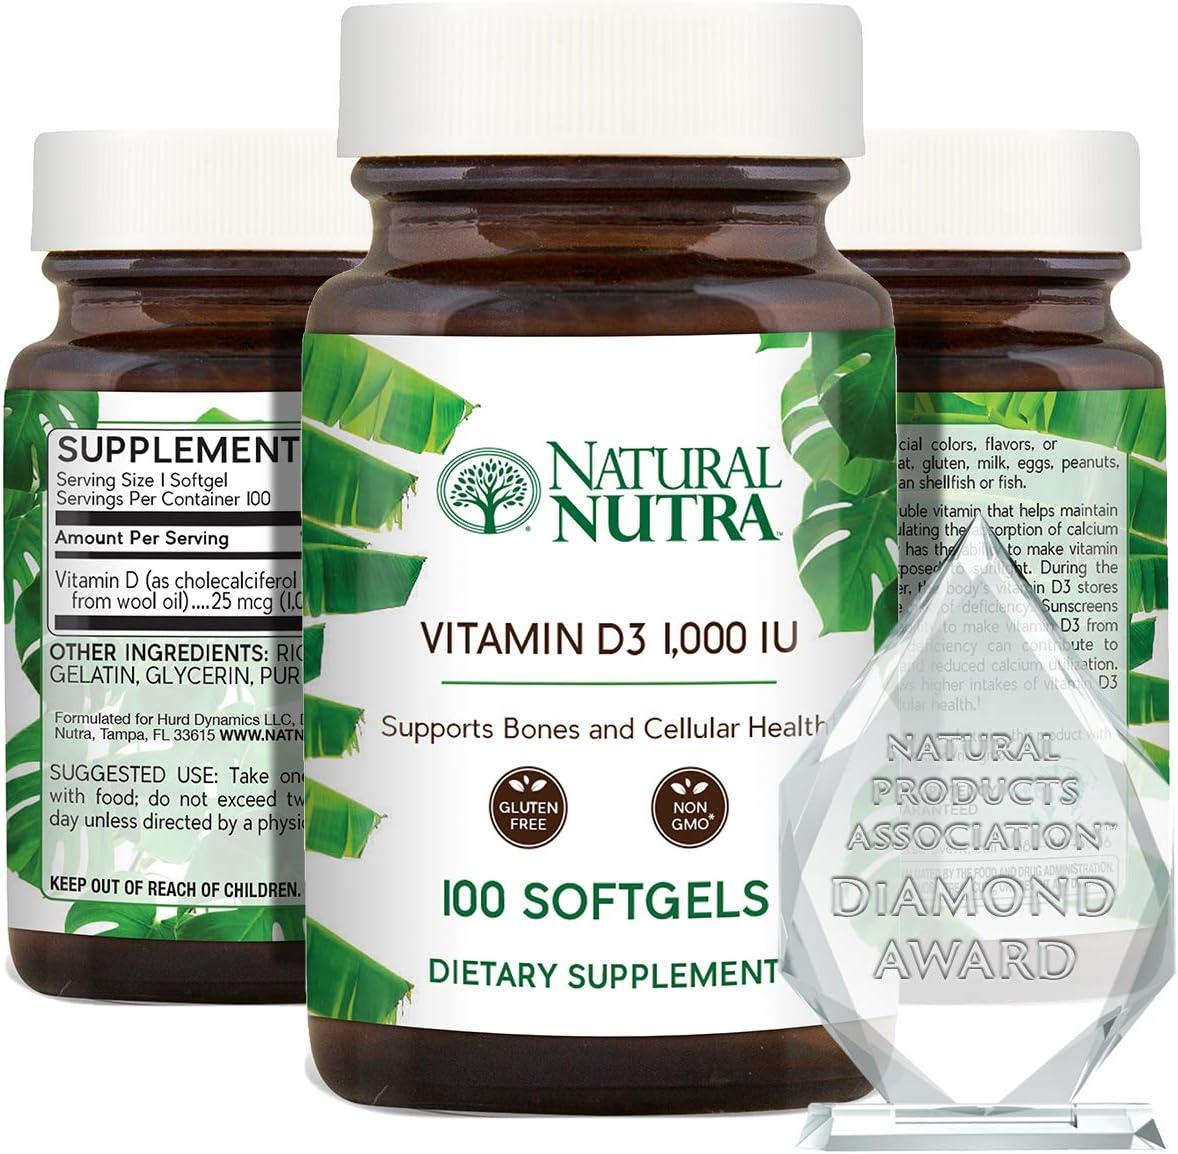 Tampa San Jose Mall Mall Natural Nutra Supreme Vitamin D3 Softgels Supplement fo 1000 IU